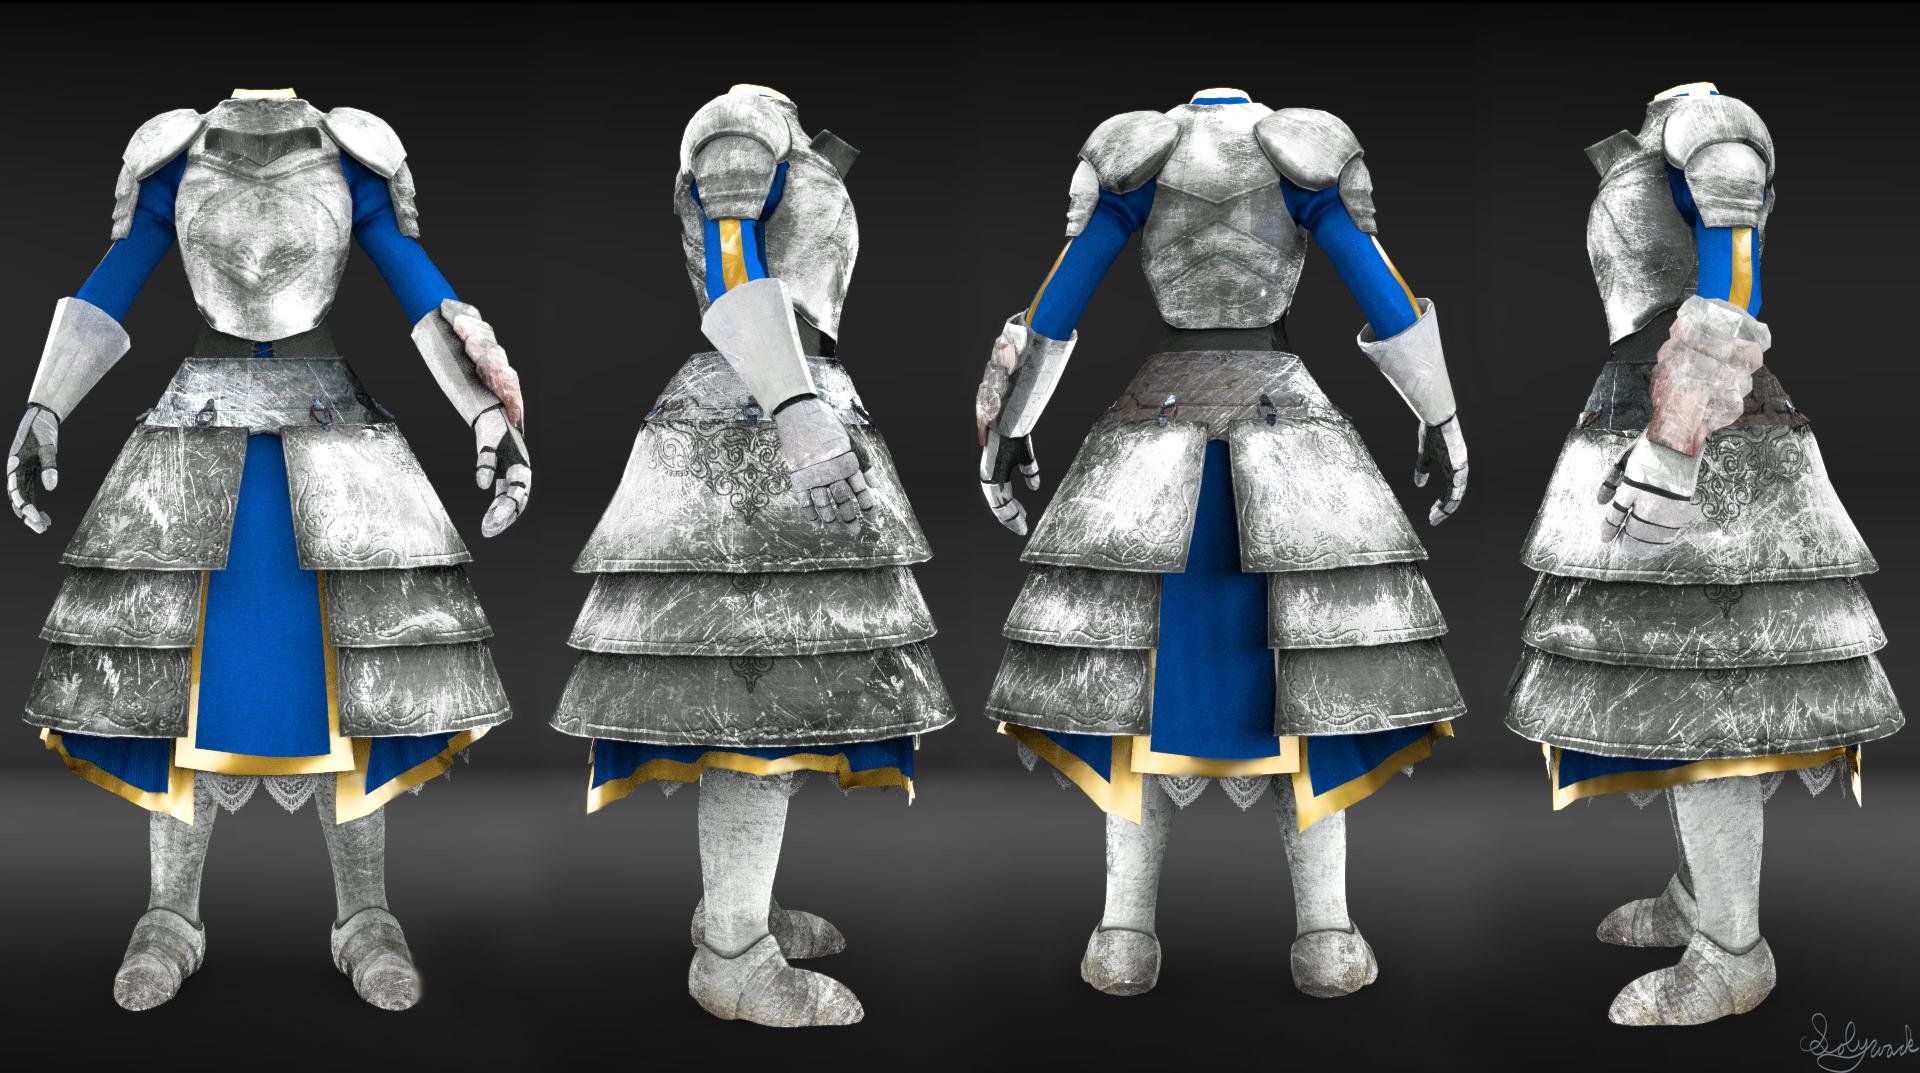 Artoria's Armor Skyrim Mod 3D Render by SolyWack on DeviantArt